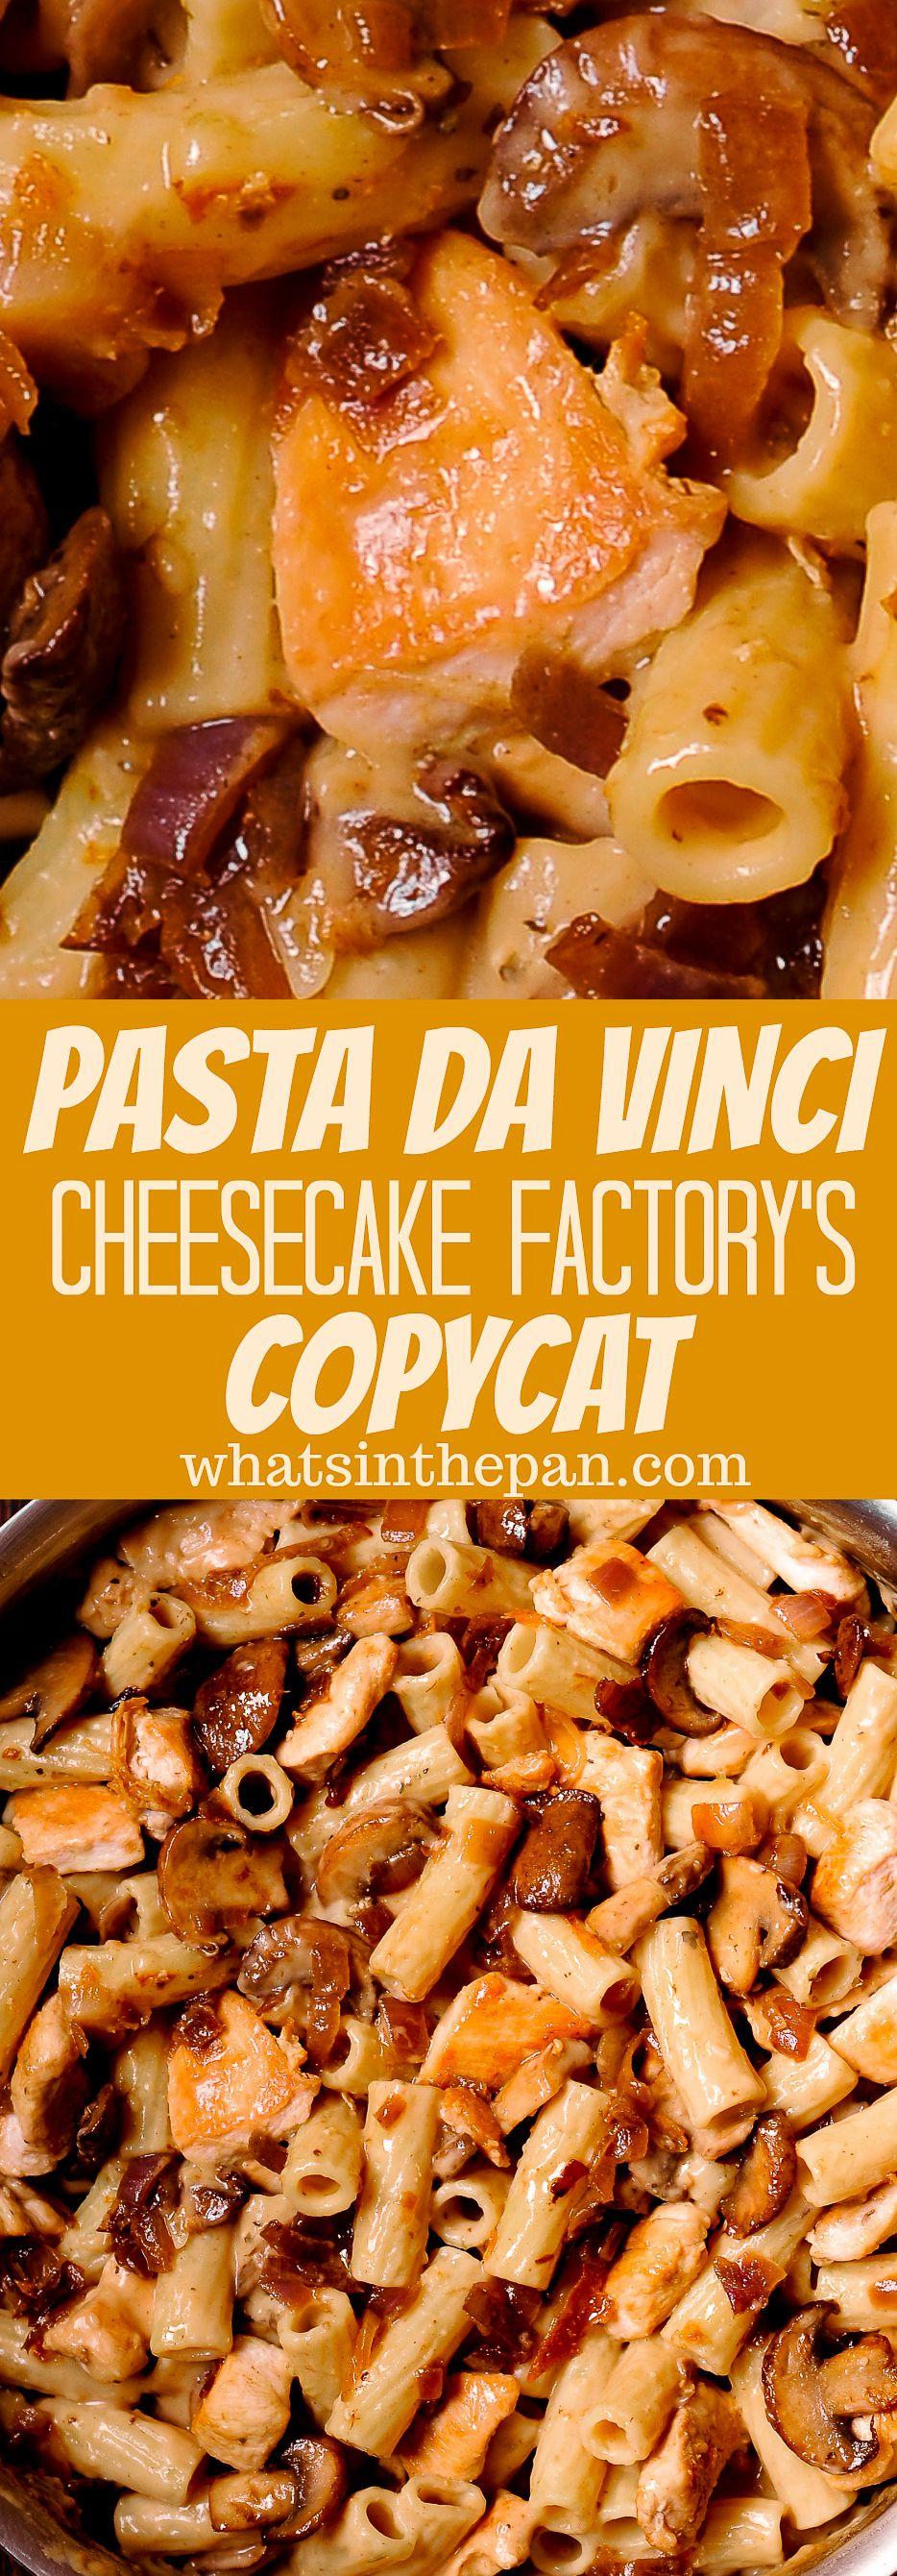 Cheesecake Factory Pasta Da Vinci Copycat